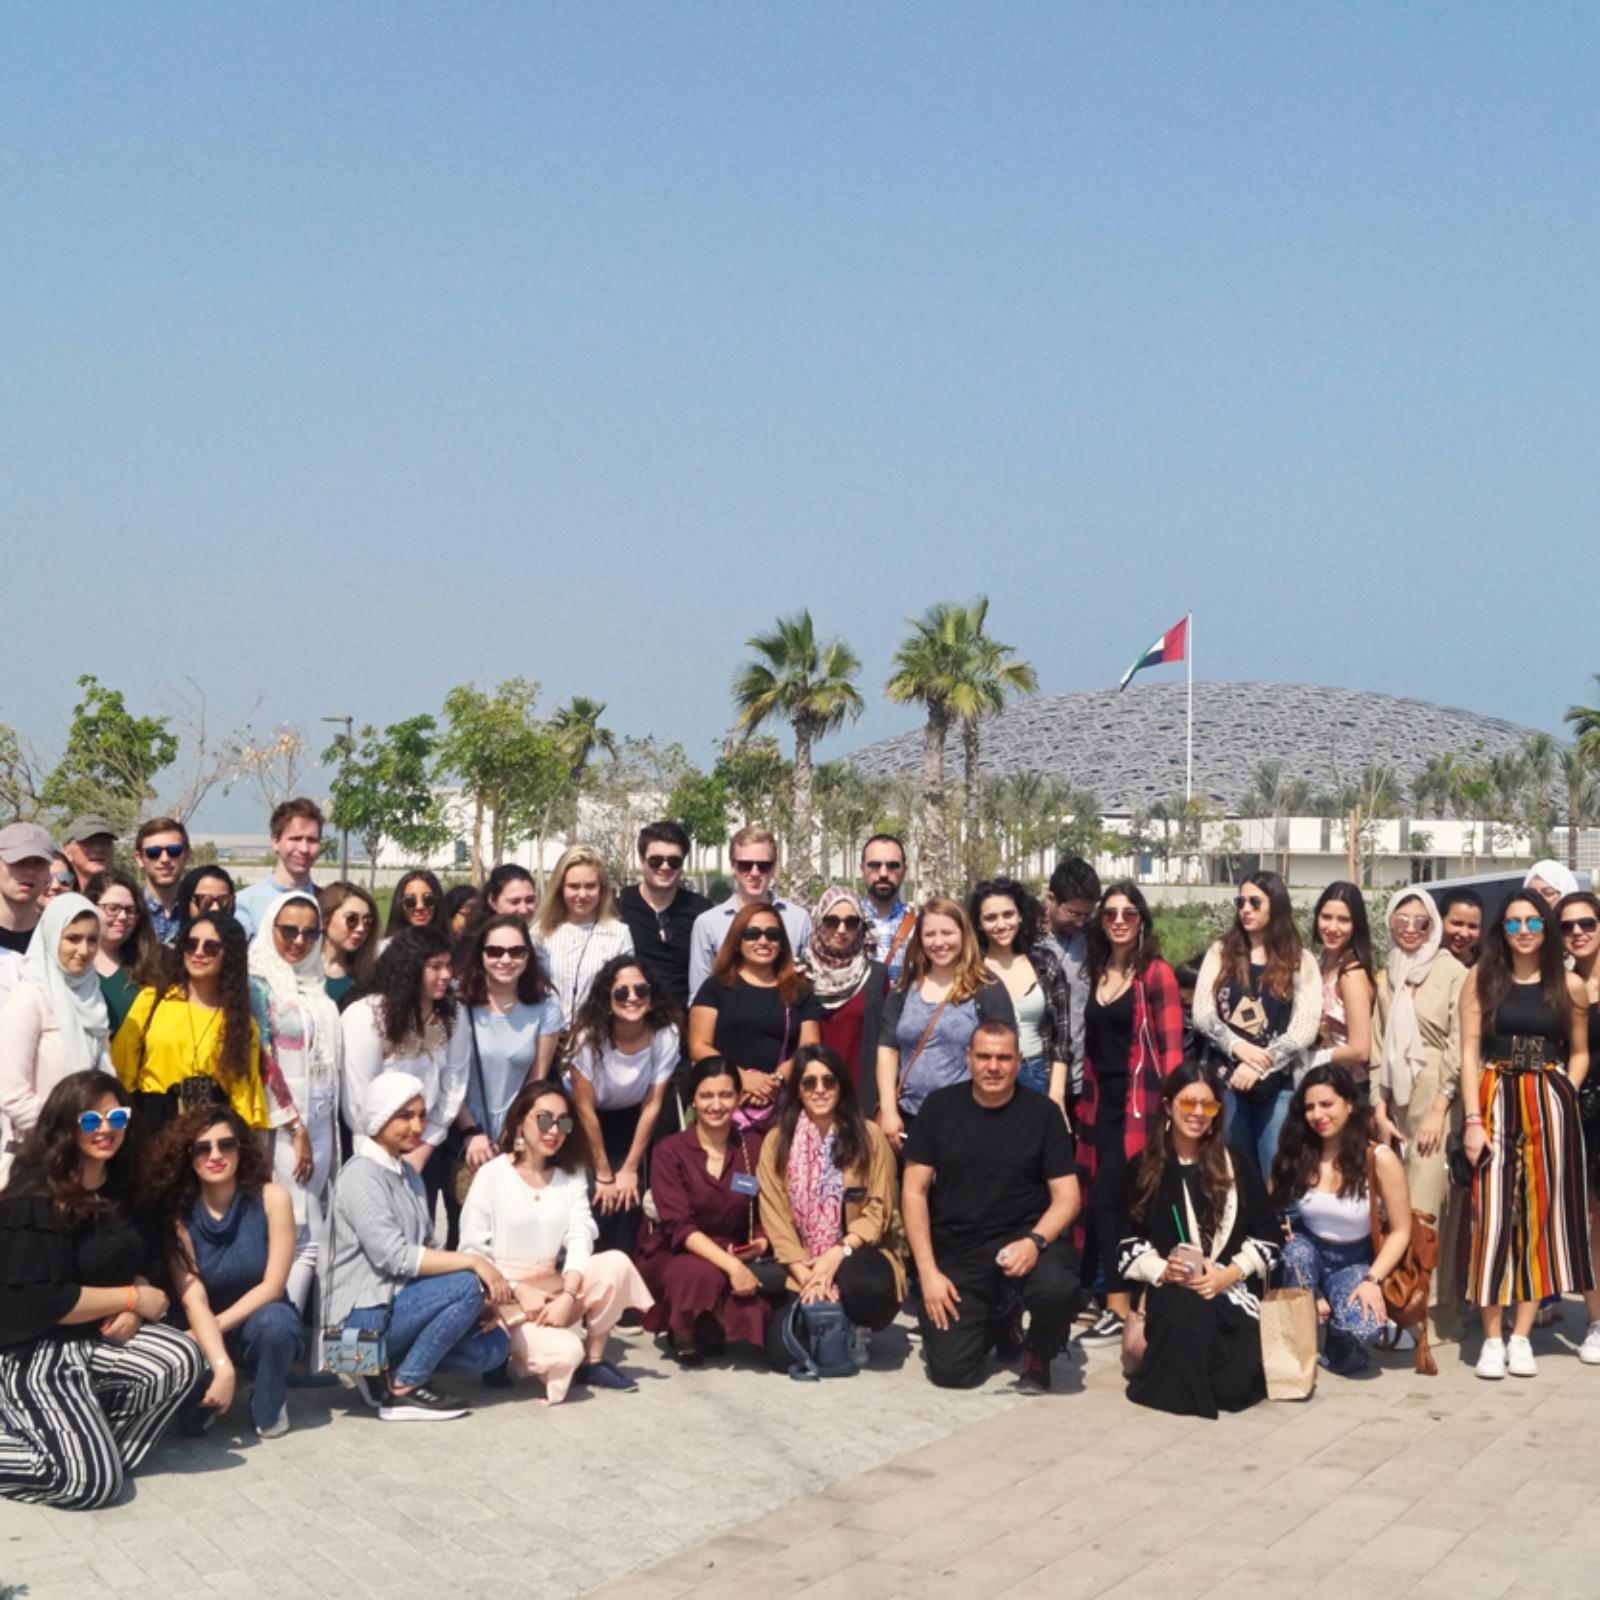 International-Conference-in-Dubai_4